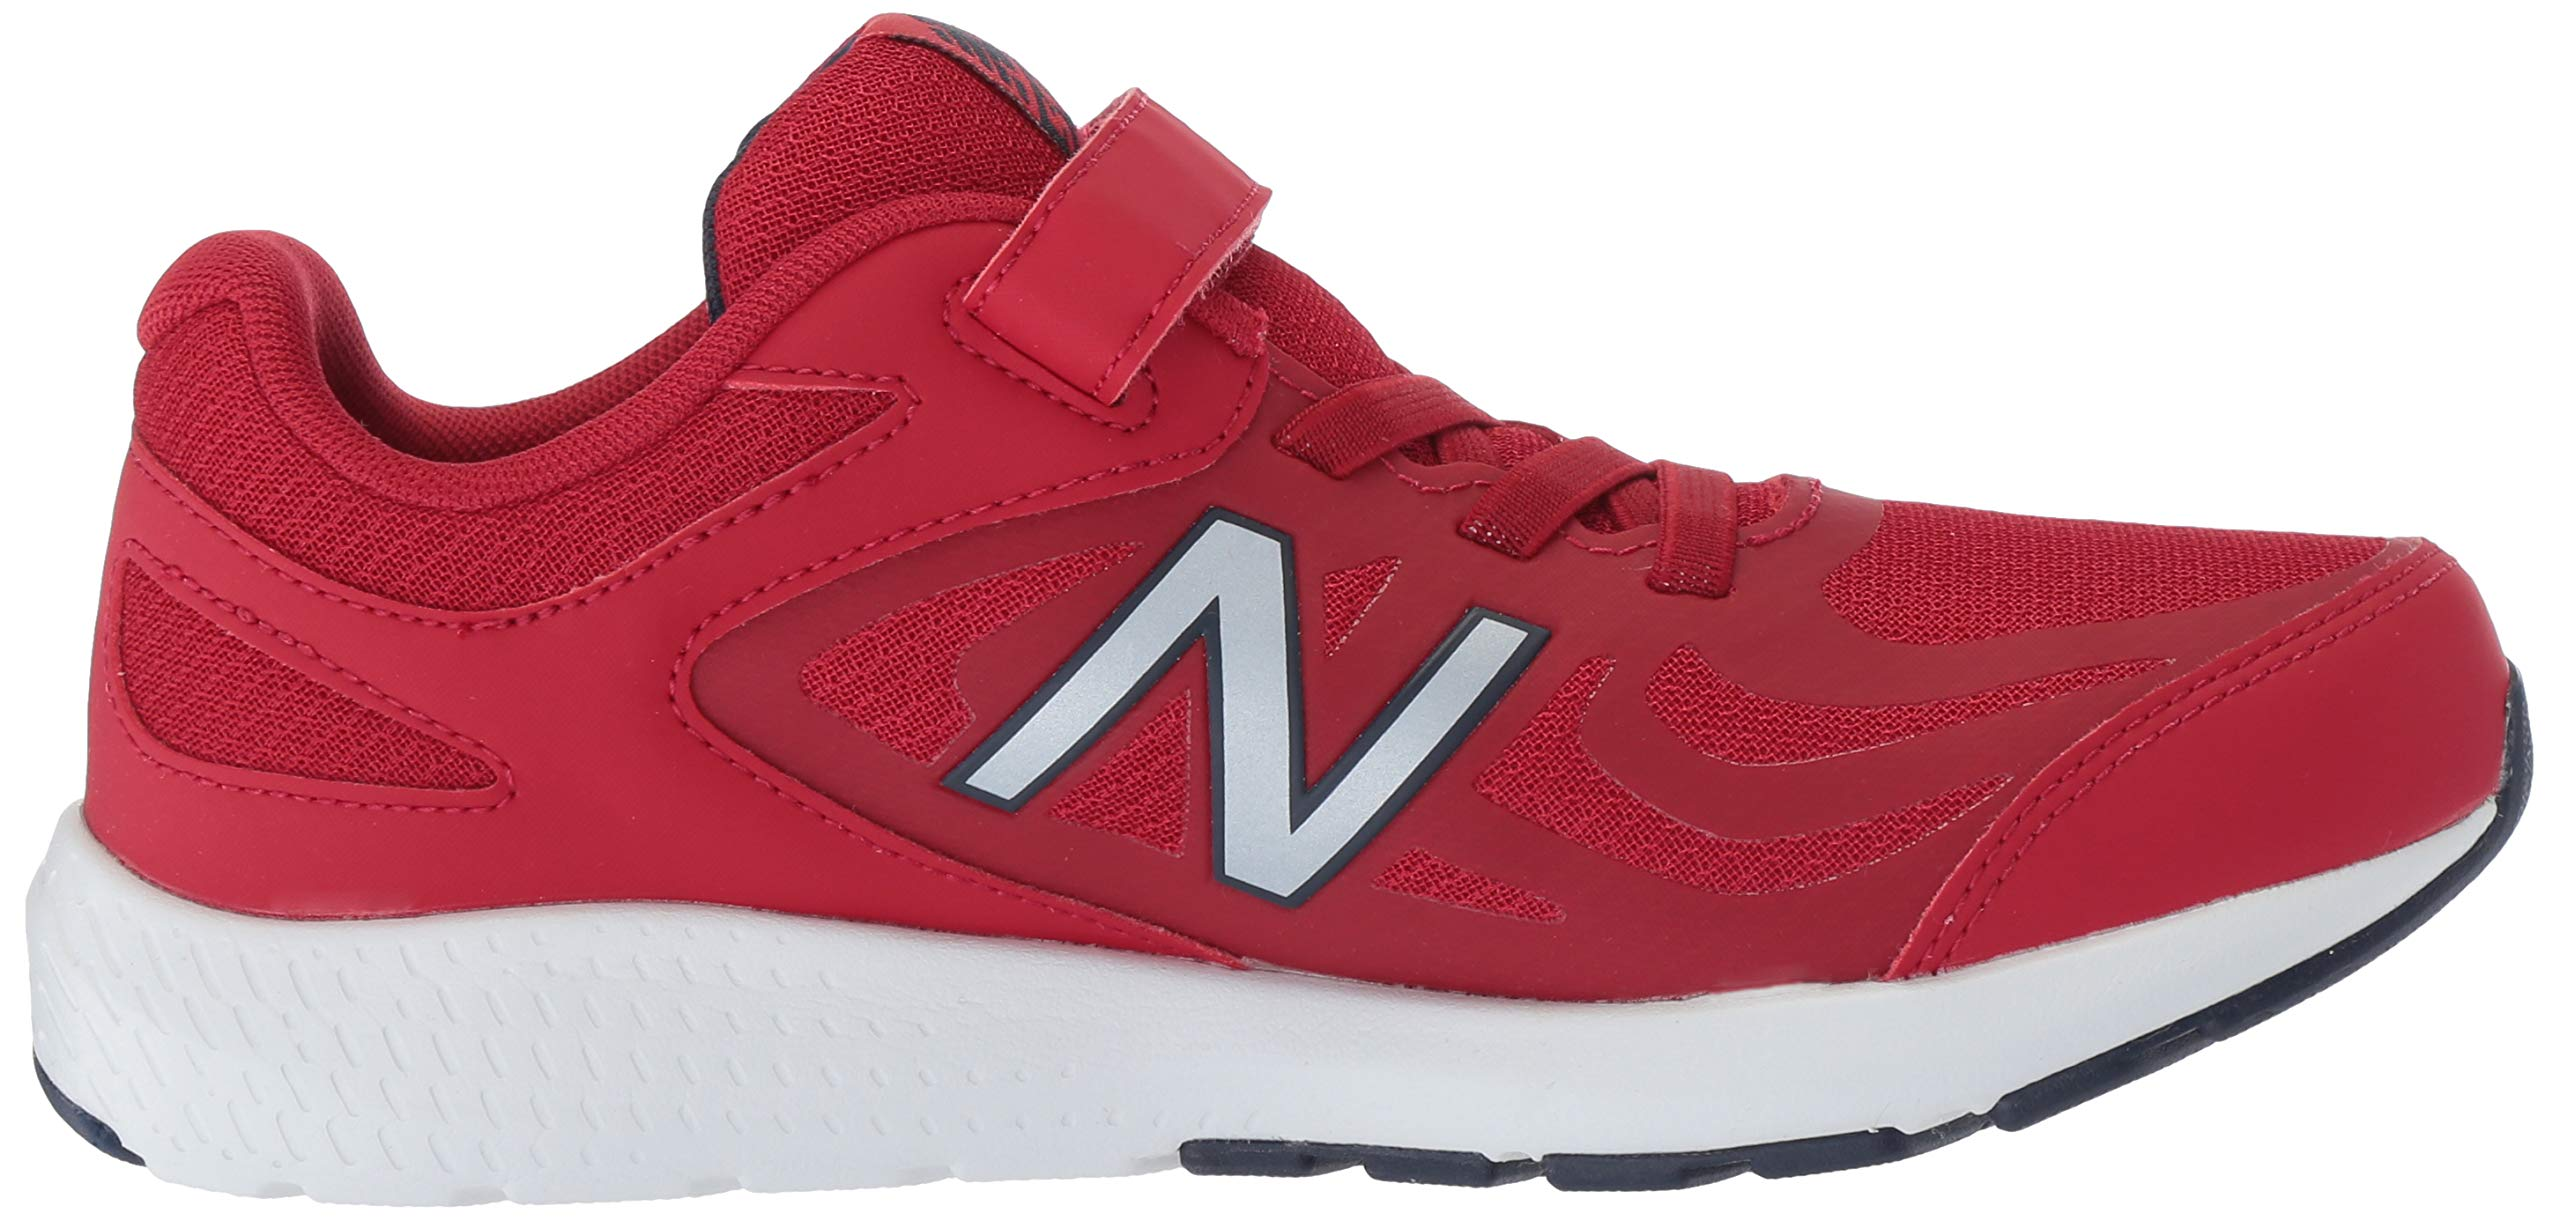 New Balance Boys' 519v1 Hook and Loop Running Shoe, Chili Pepper/Nubuck Scarlet, 2 M US Infant by New Balance (Image #7)